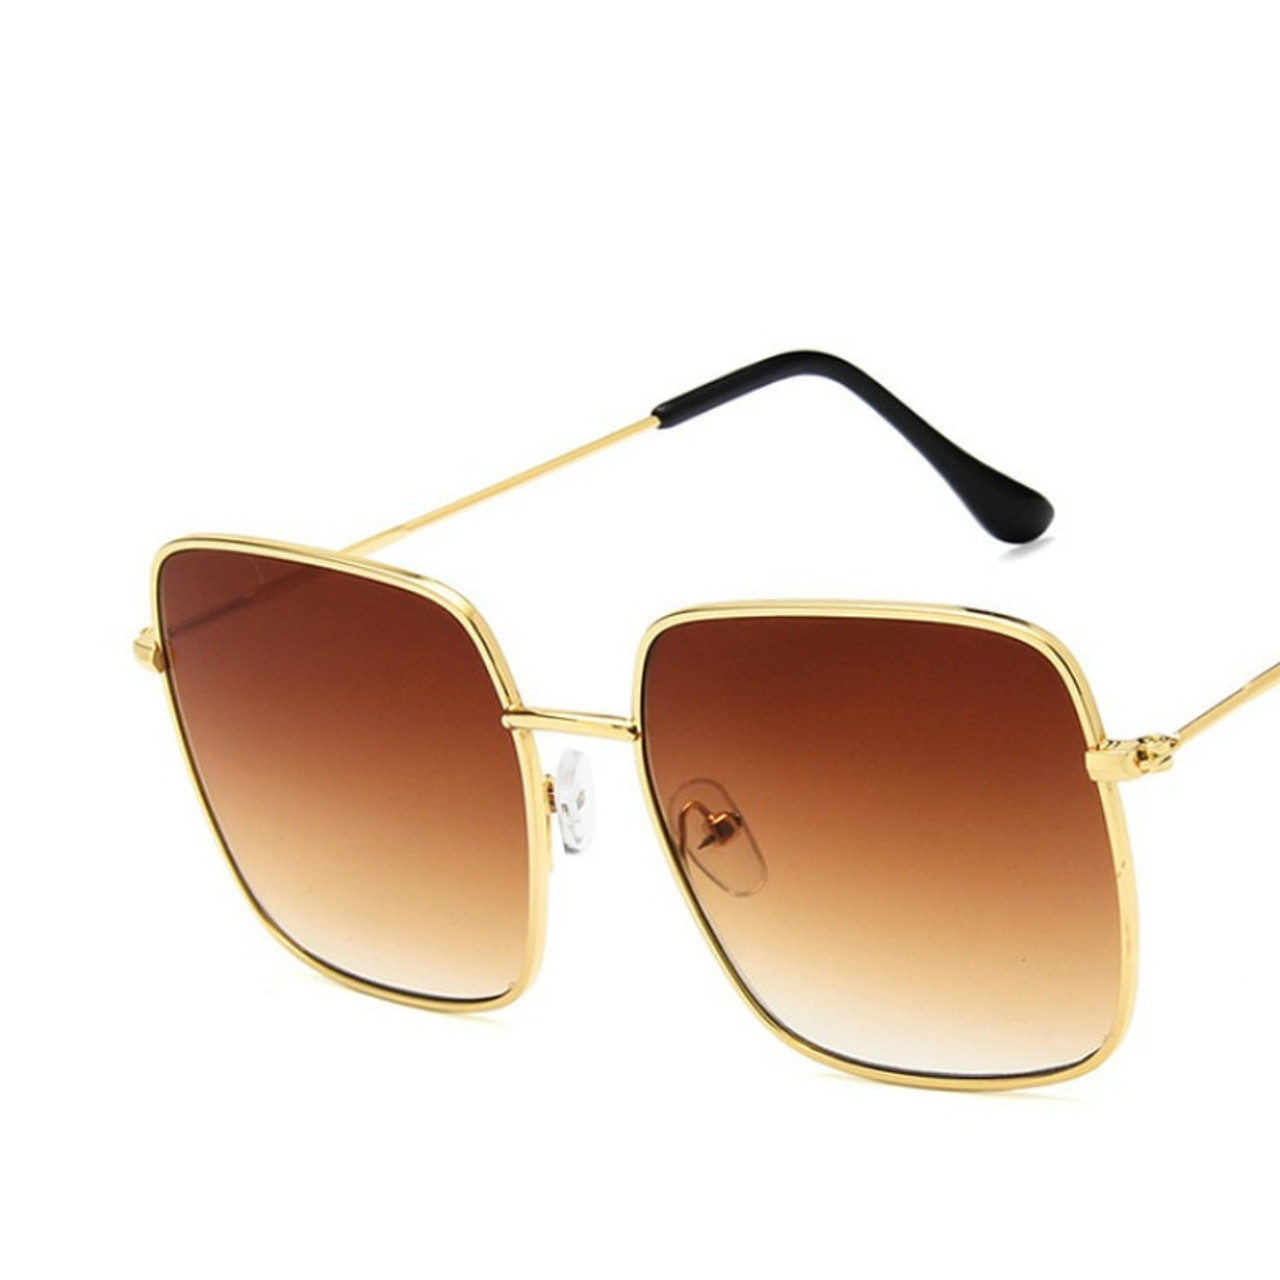 f8750a49e42 ... 2018 Newest square frame vintage sunglasses Women Oversized Big Size Sun  Glasses for Men Female Shades ...